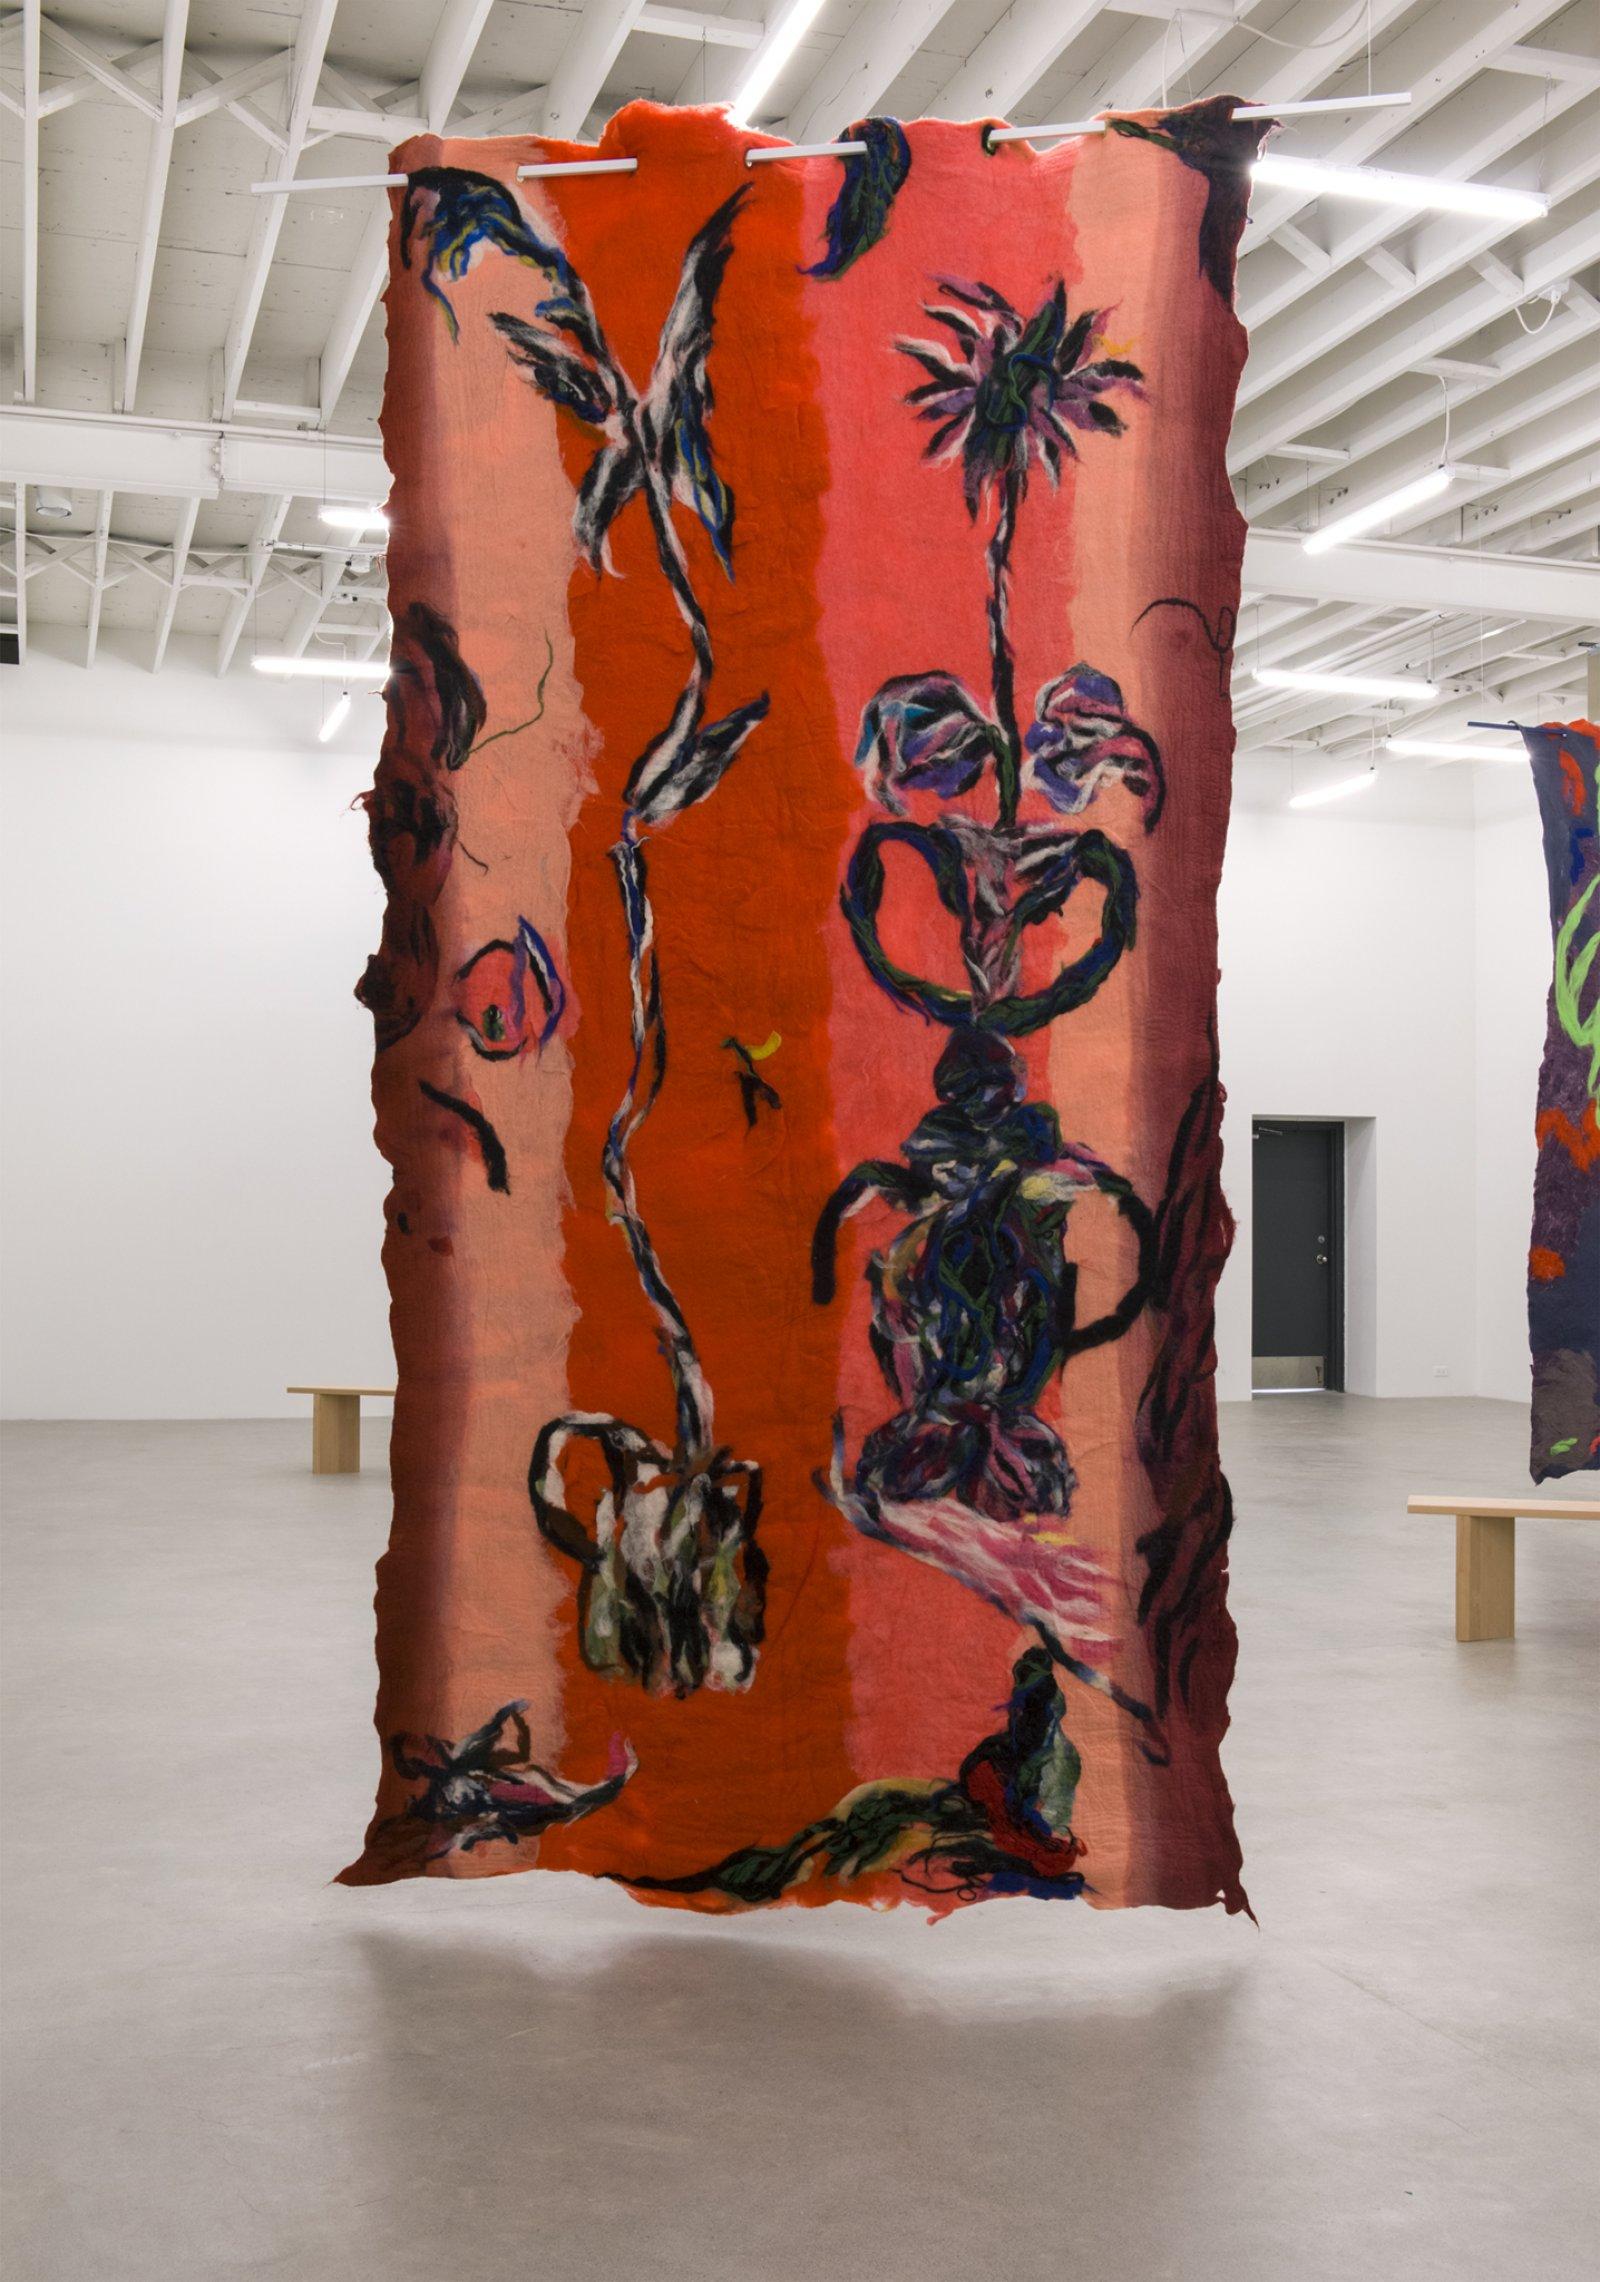 Rebecca Brewer, En F , 2016, wool felt, painted aluminum, 105 x 78 in. (266 x 198 cm) by Rebecca Brewer